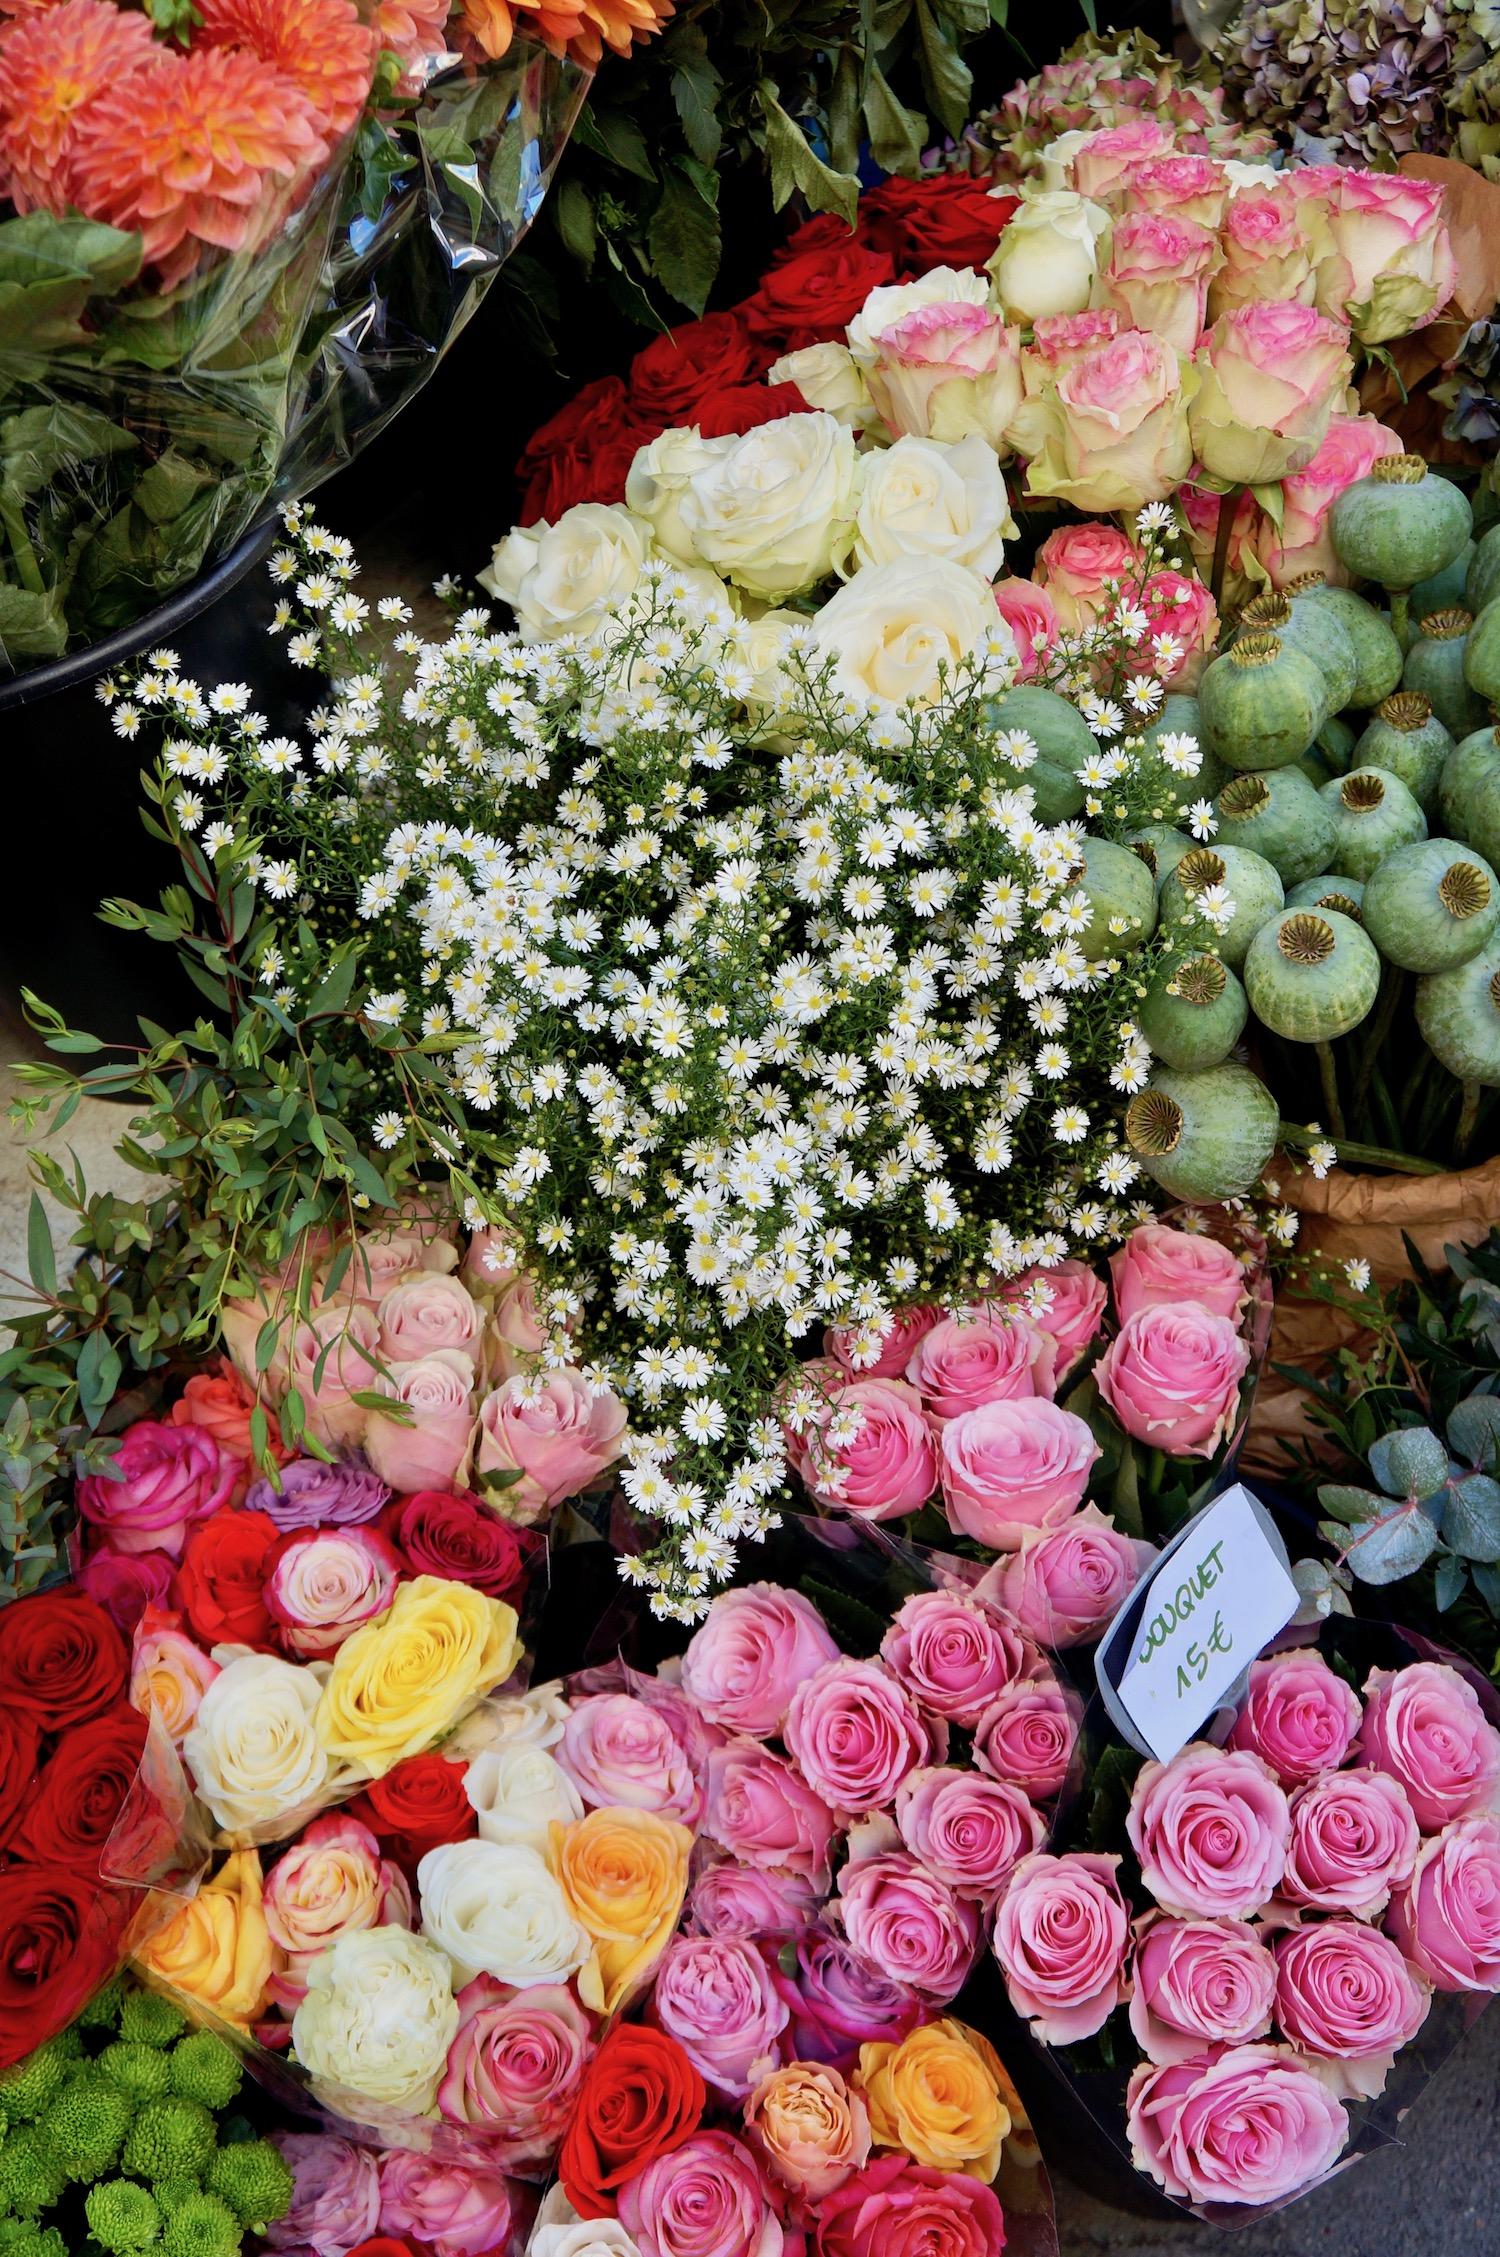 Fall Flowers in Paris